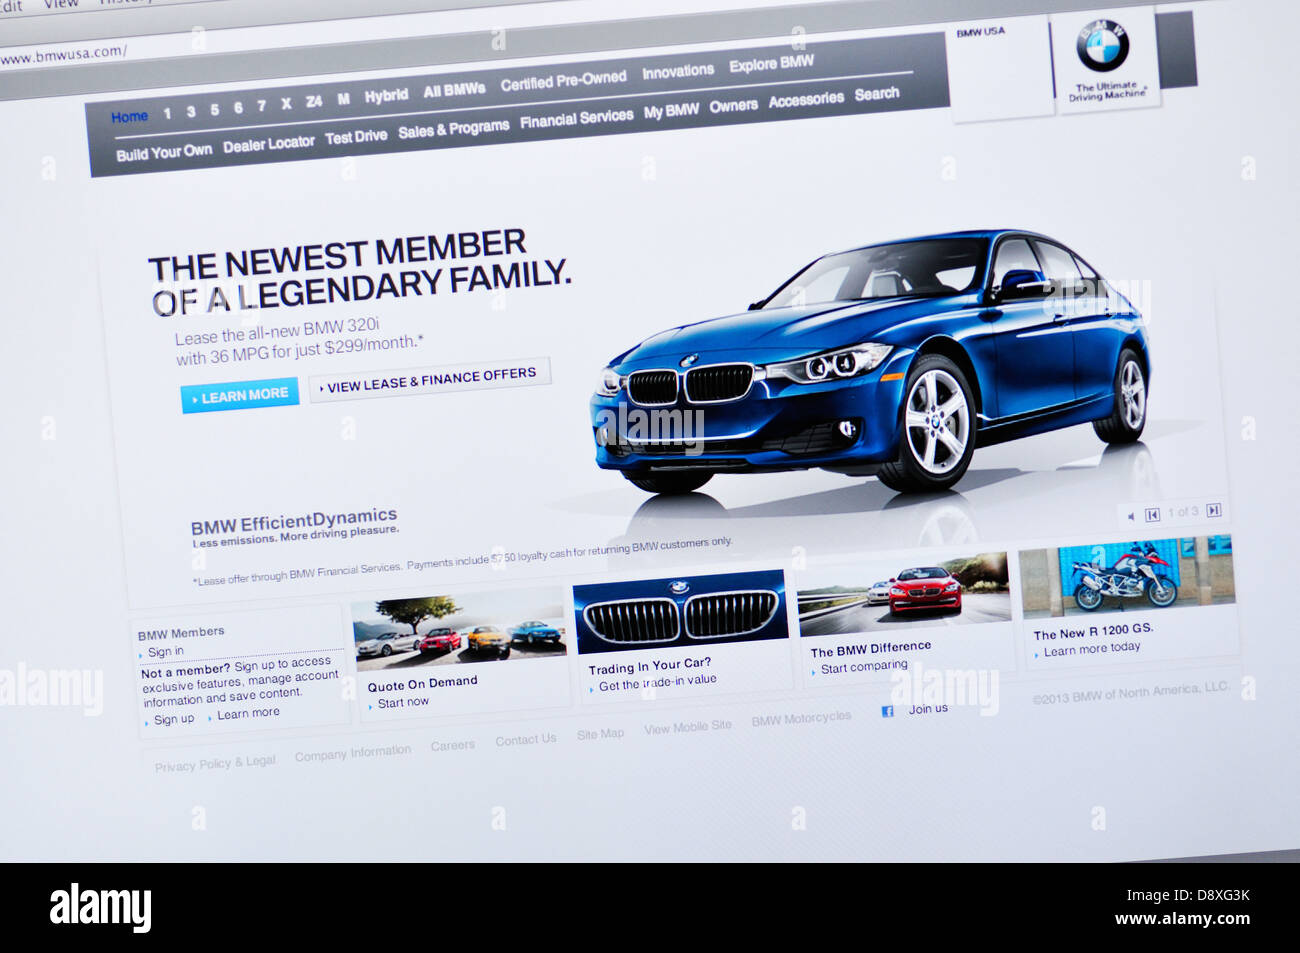 Bmw German Car Manufacturer Website Stock Photo Alamy